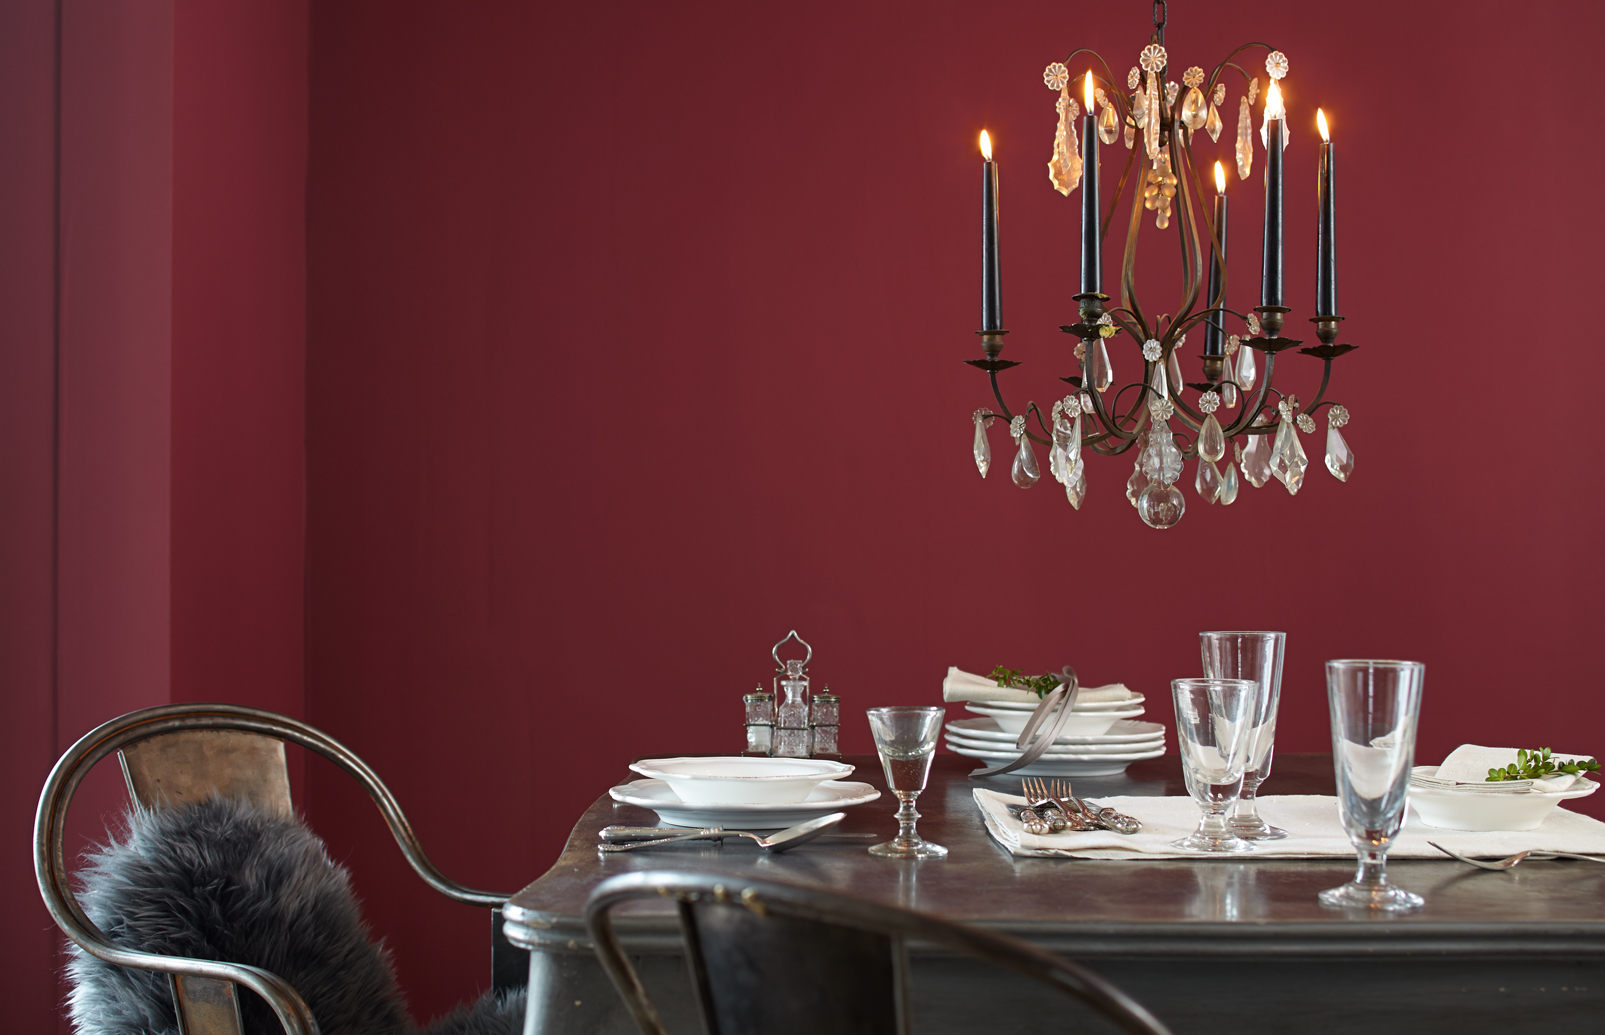 Best Rotes Esszimmer Fur Intensive Einladende Atmosphare Images ...